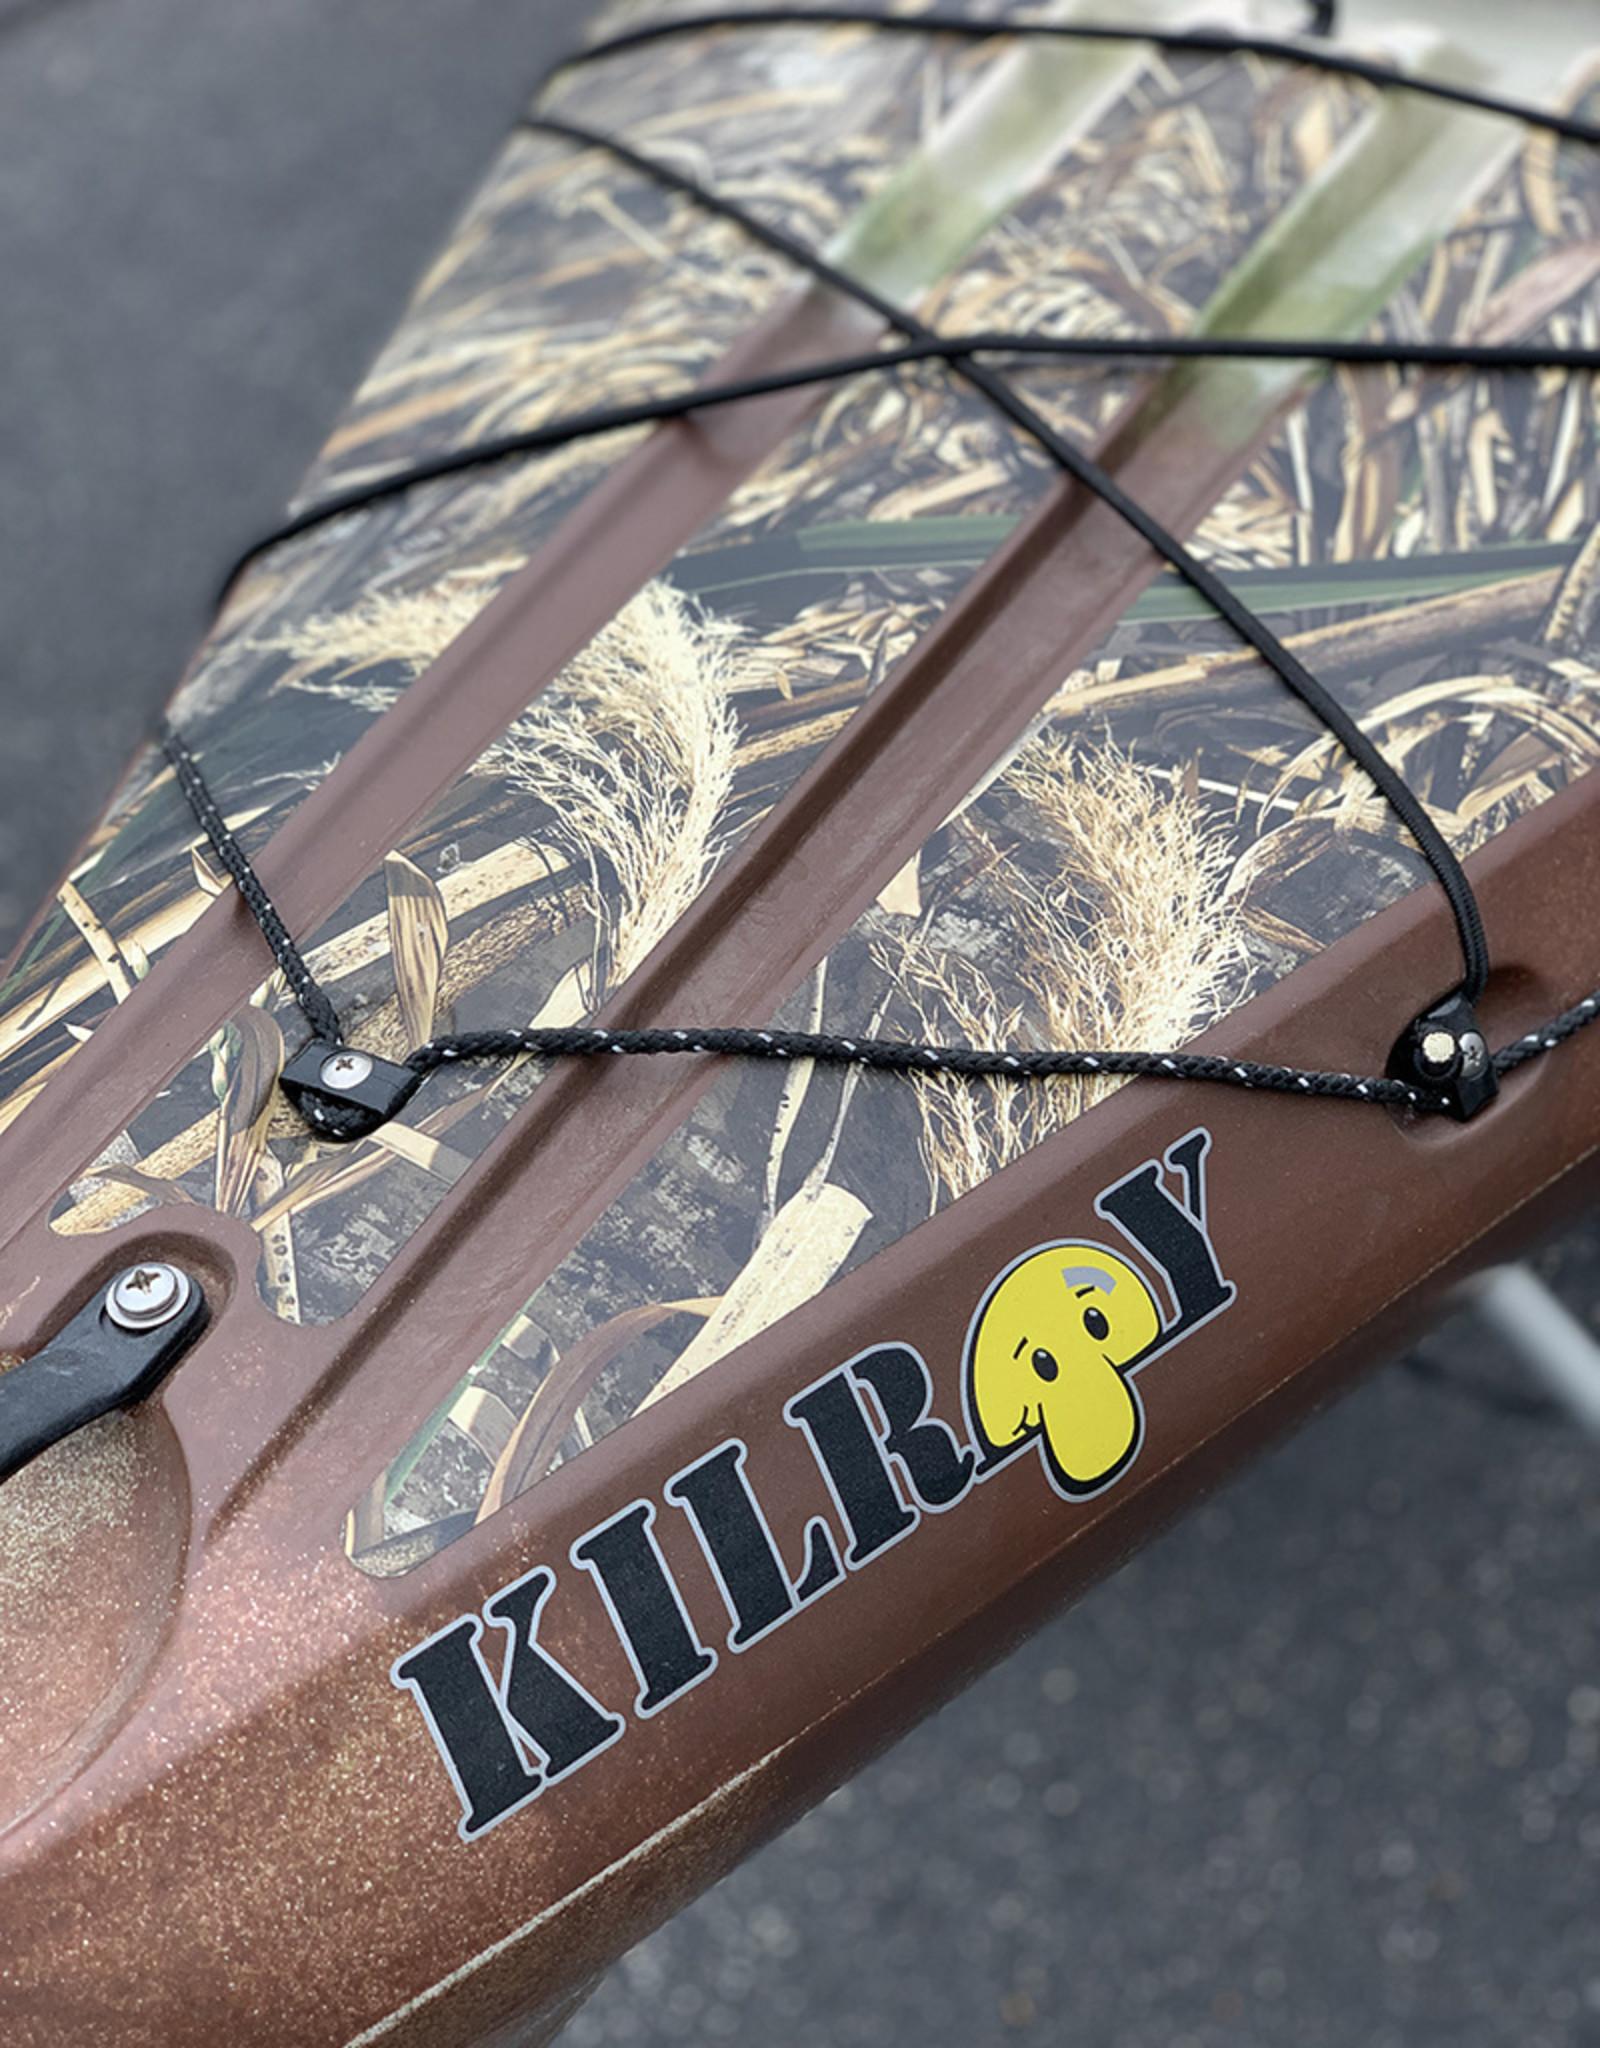 Jackson Kayak Used 2015 Kilroy Realtree Camo Edition